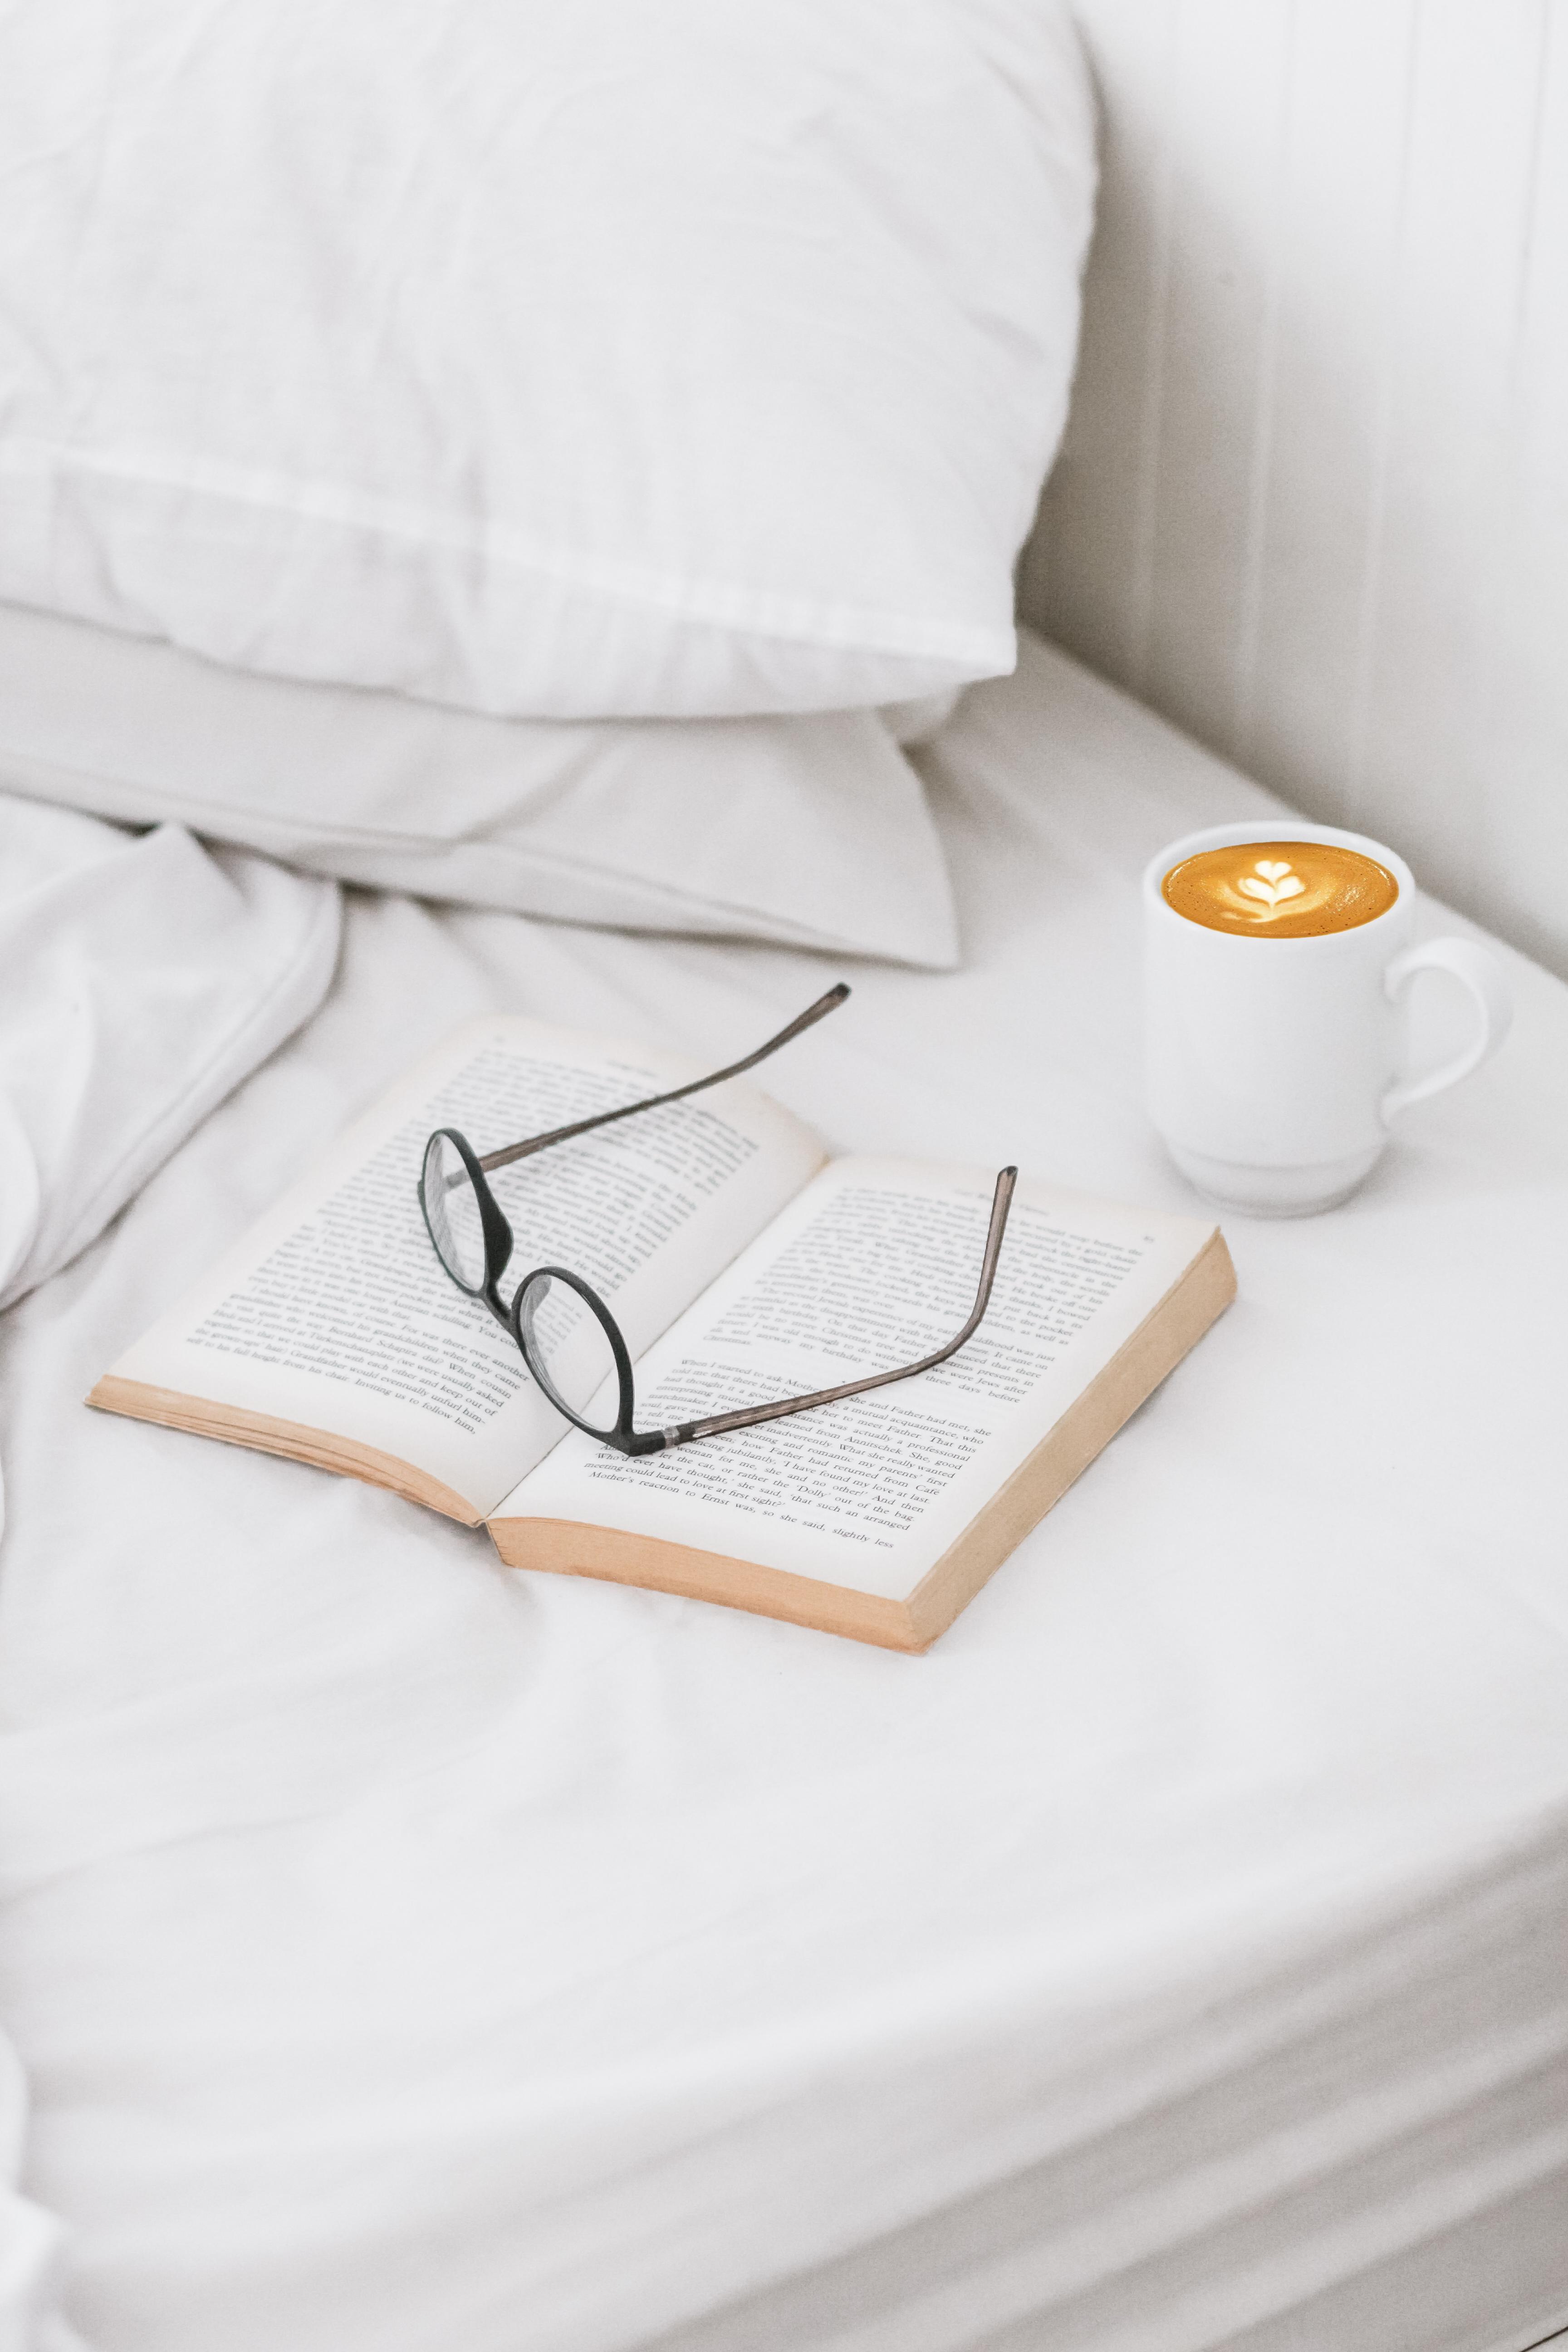 coffee on ceramic mug, book, and eyeglass on bed